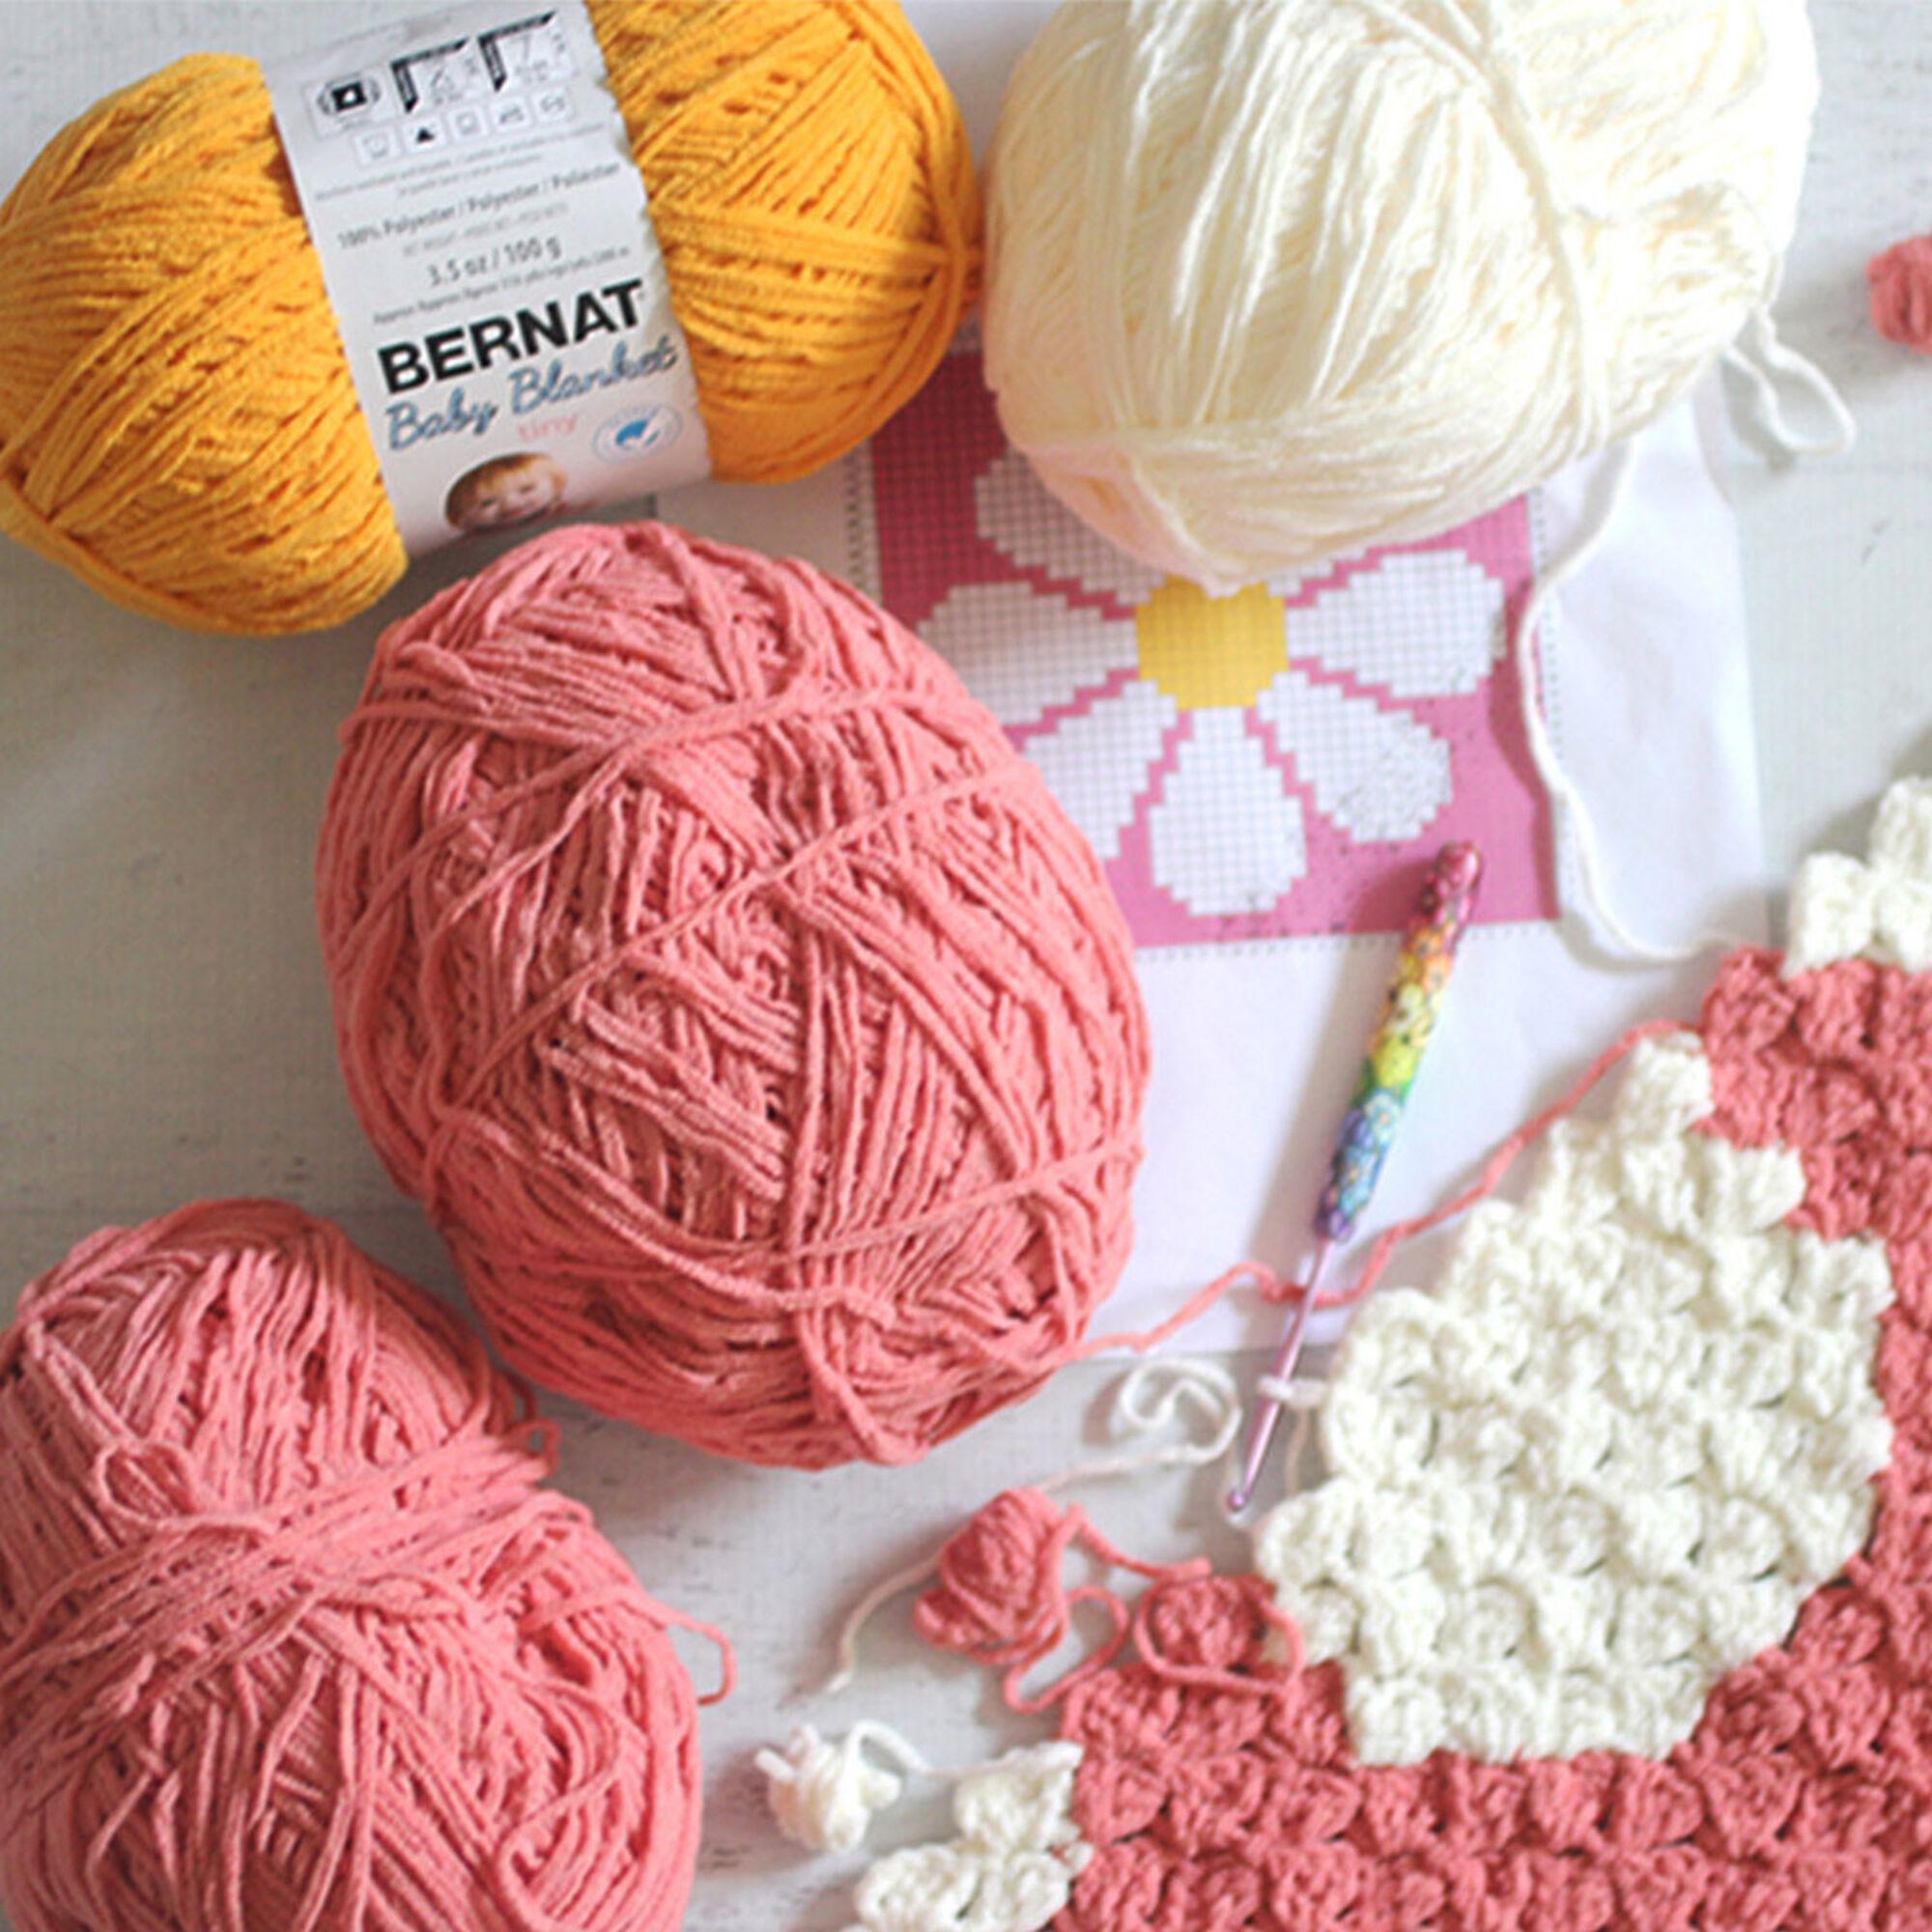 Bernat Daisy C2C Crochet Blanket | Yarnspirations